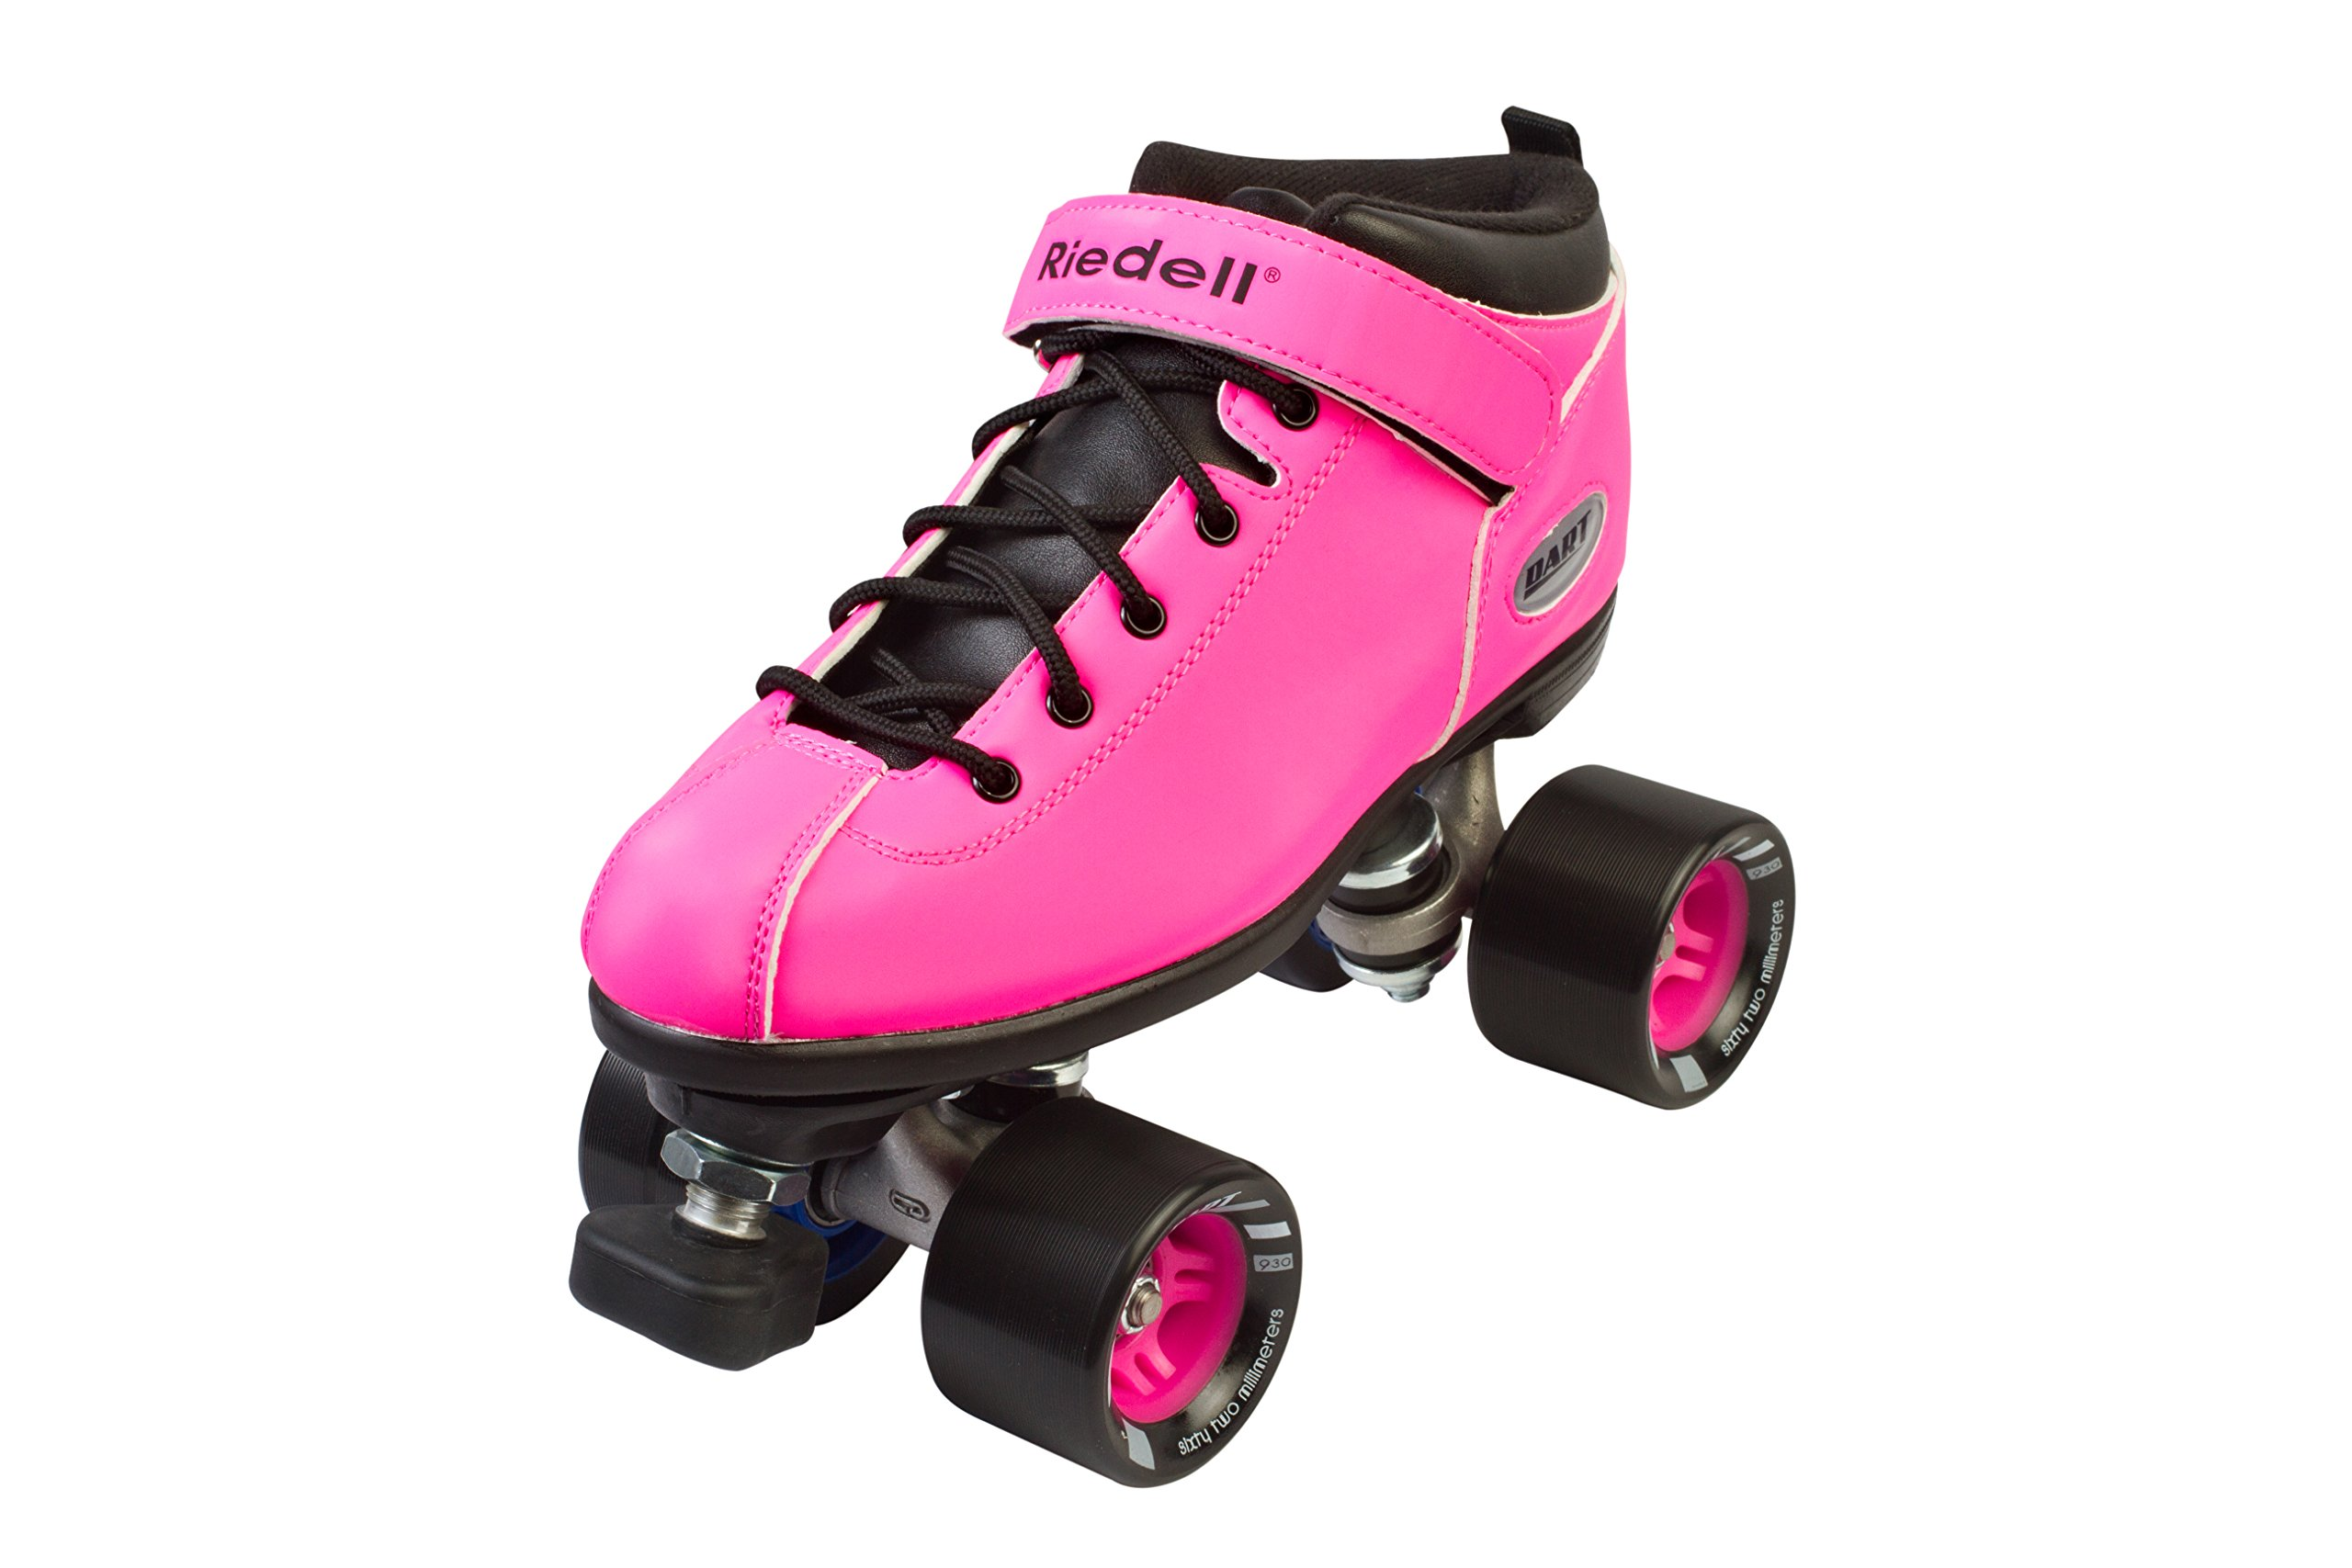 Riedell Roller Dart (Pink, 9 Medium) by Speed